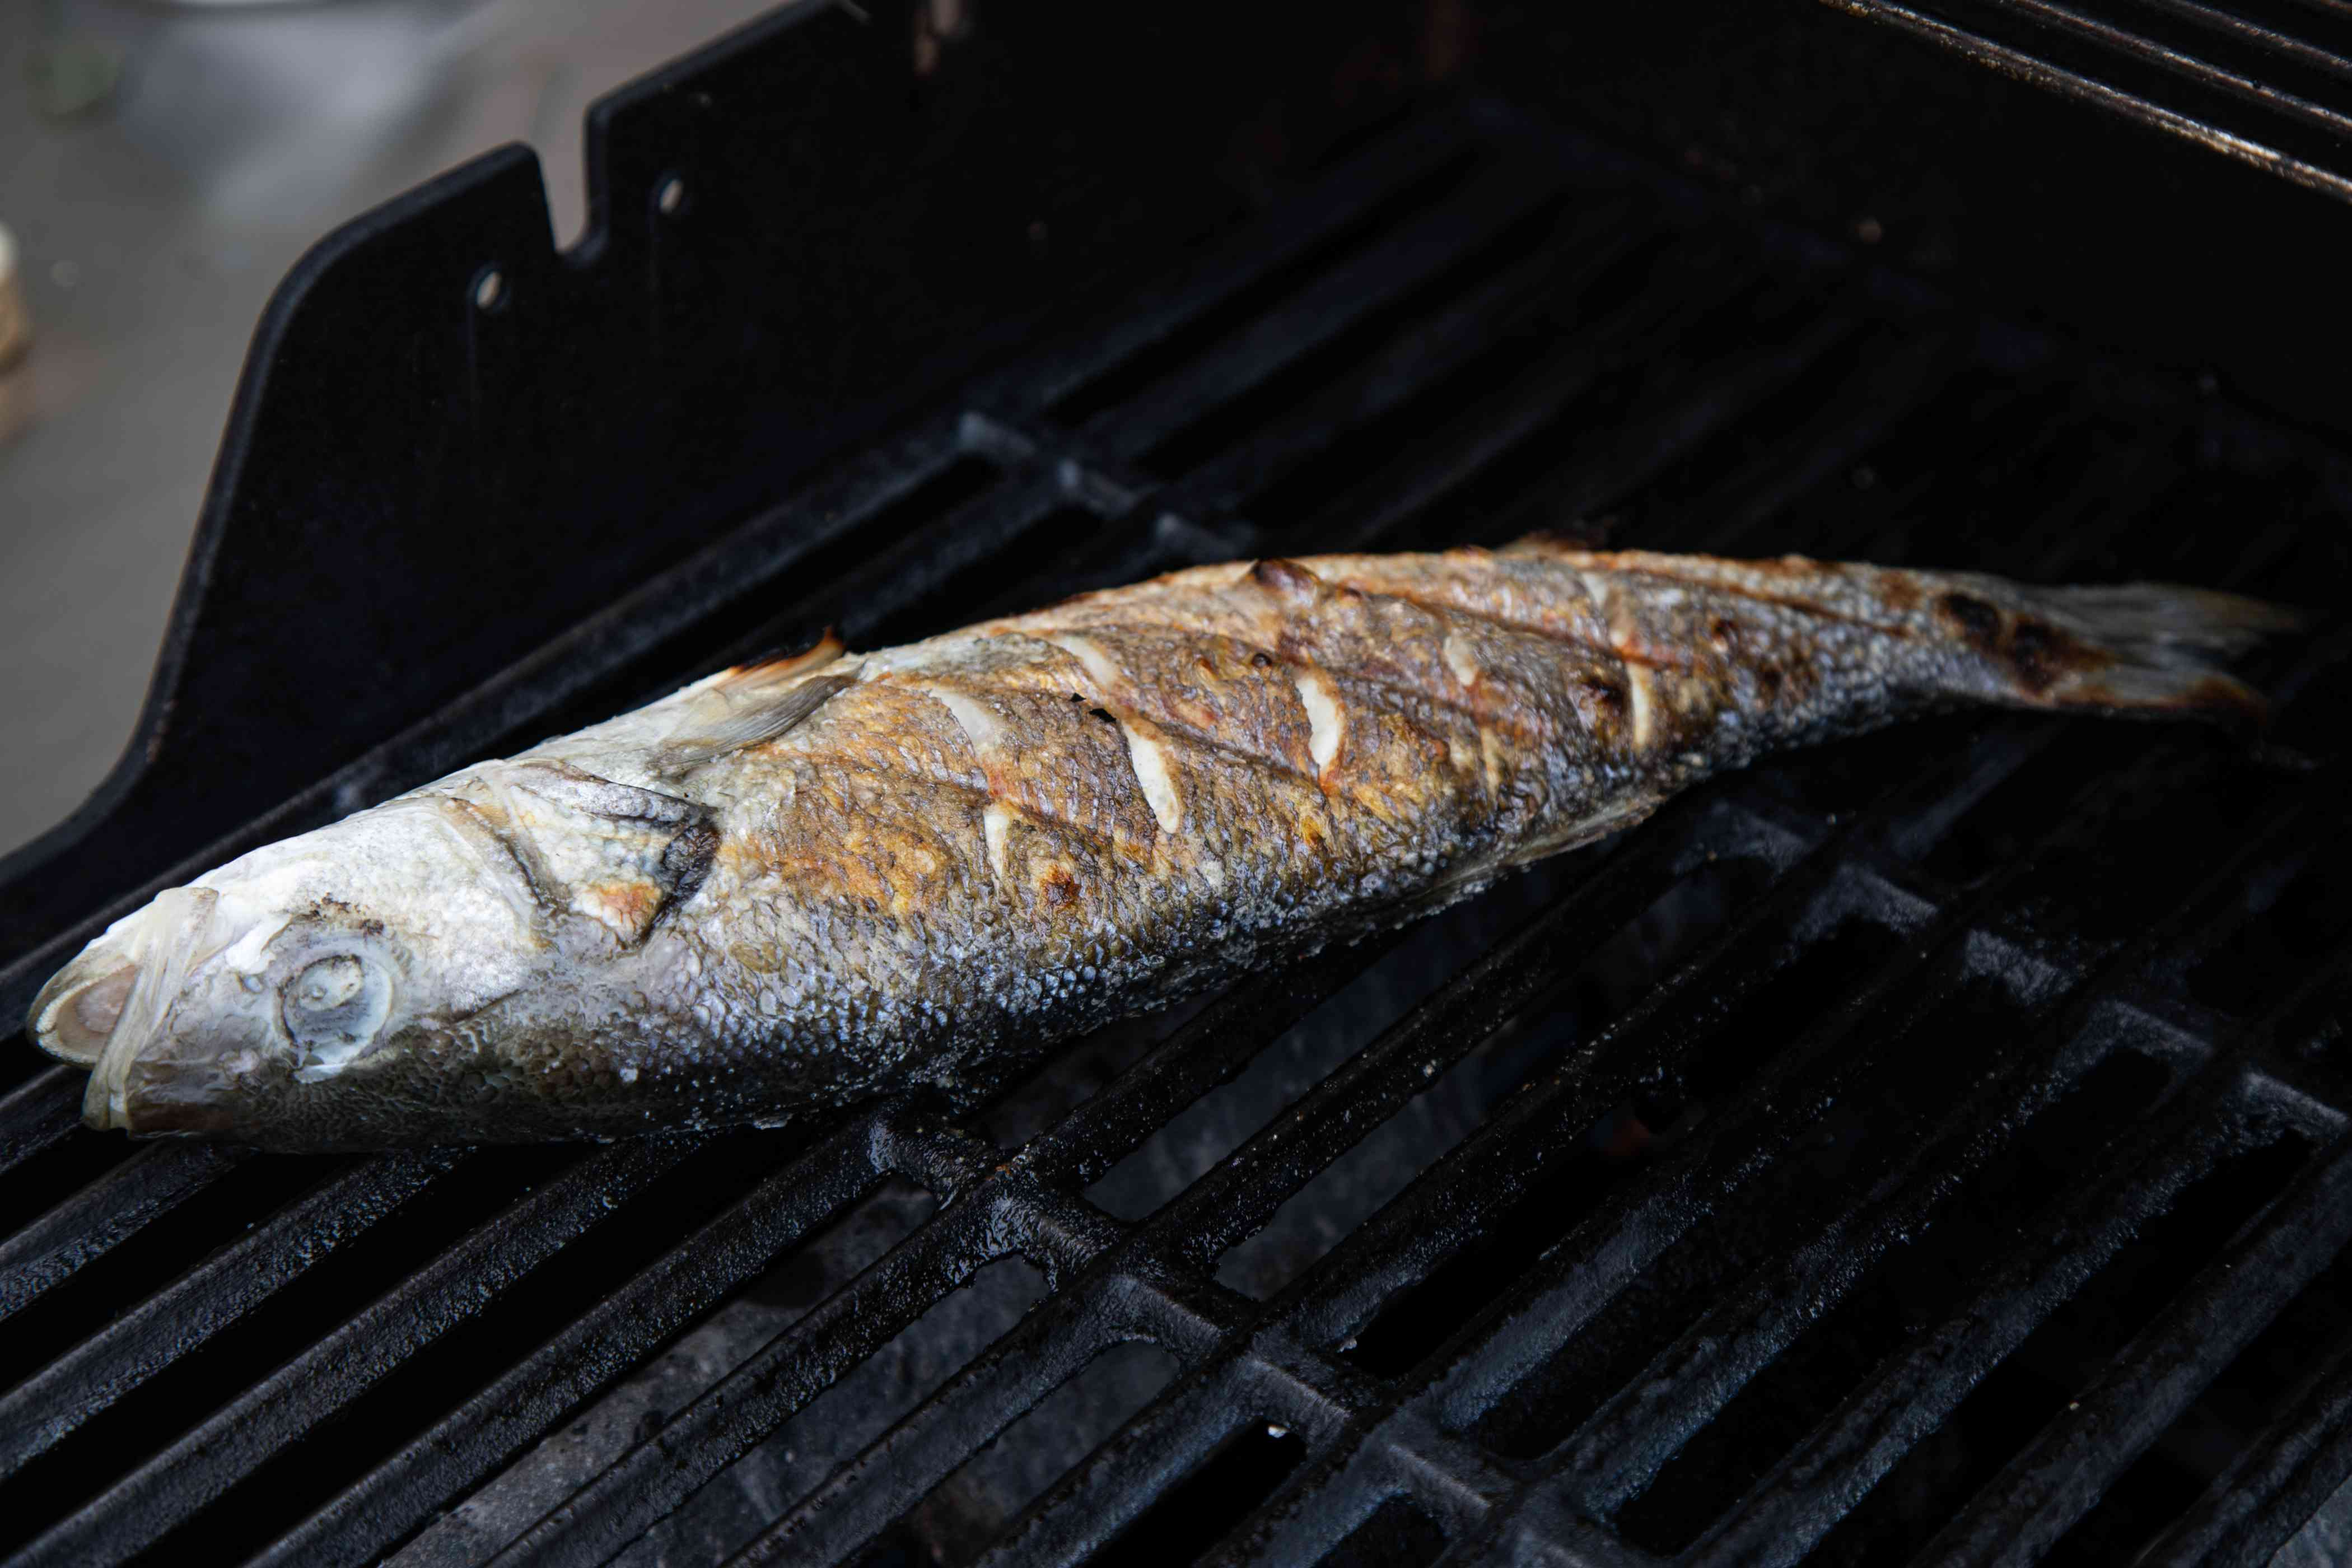 A whole bronzino fish on a grill.